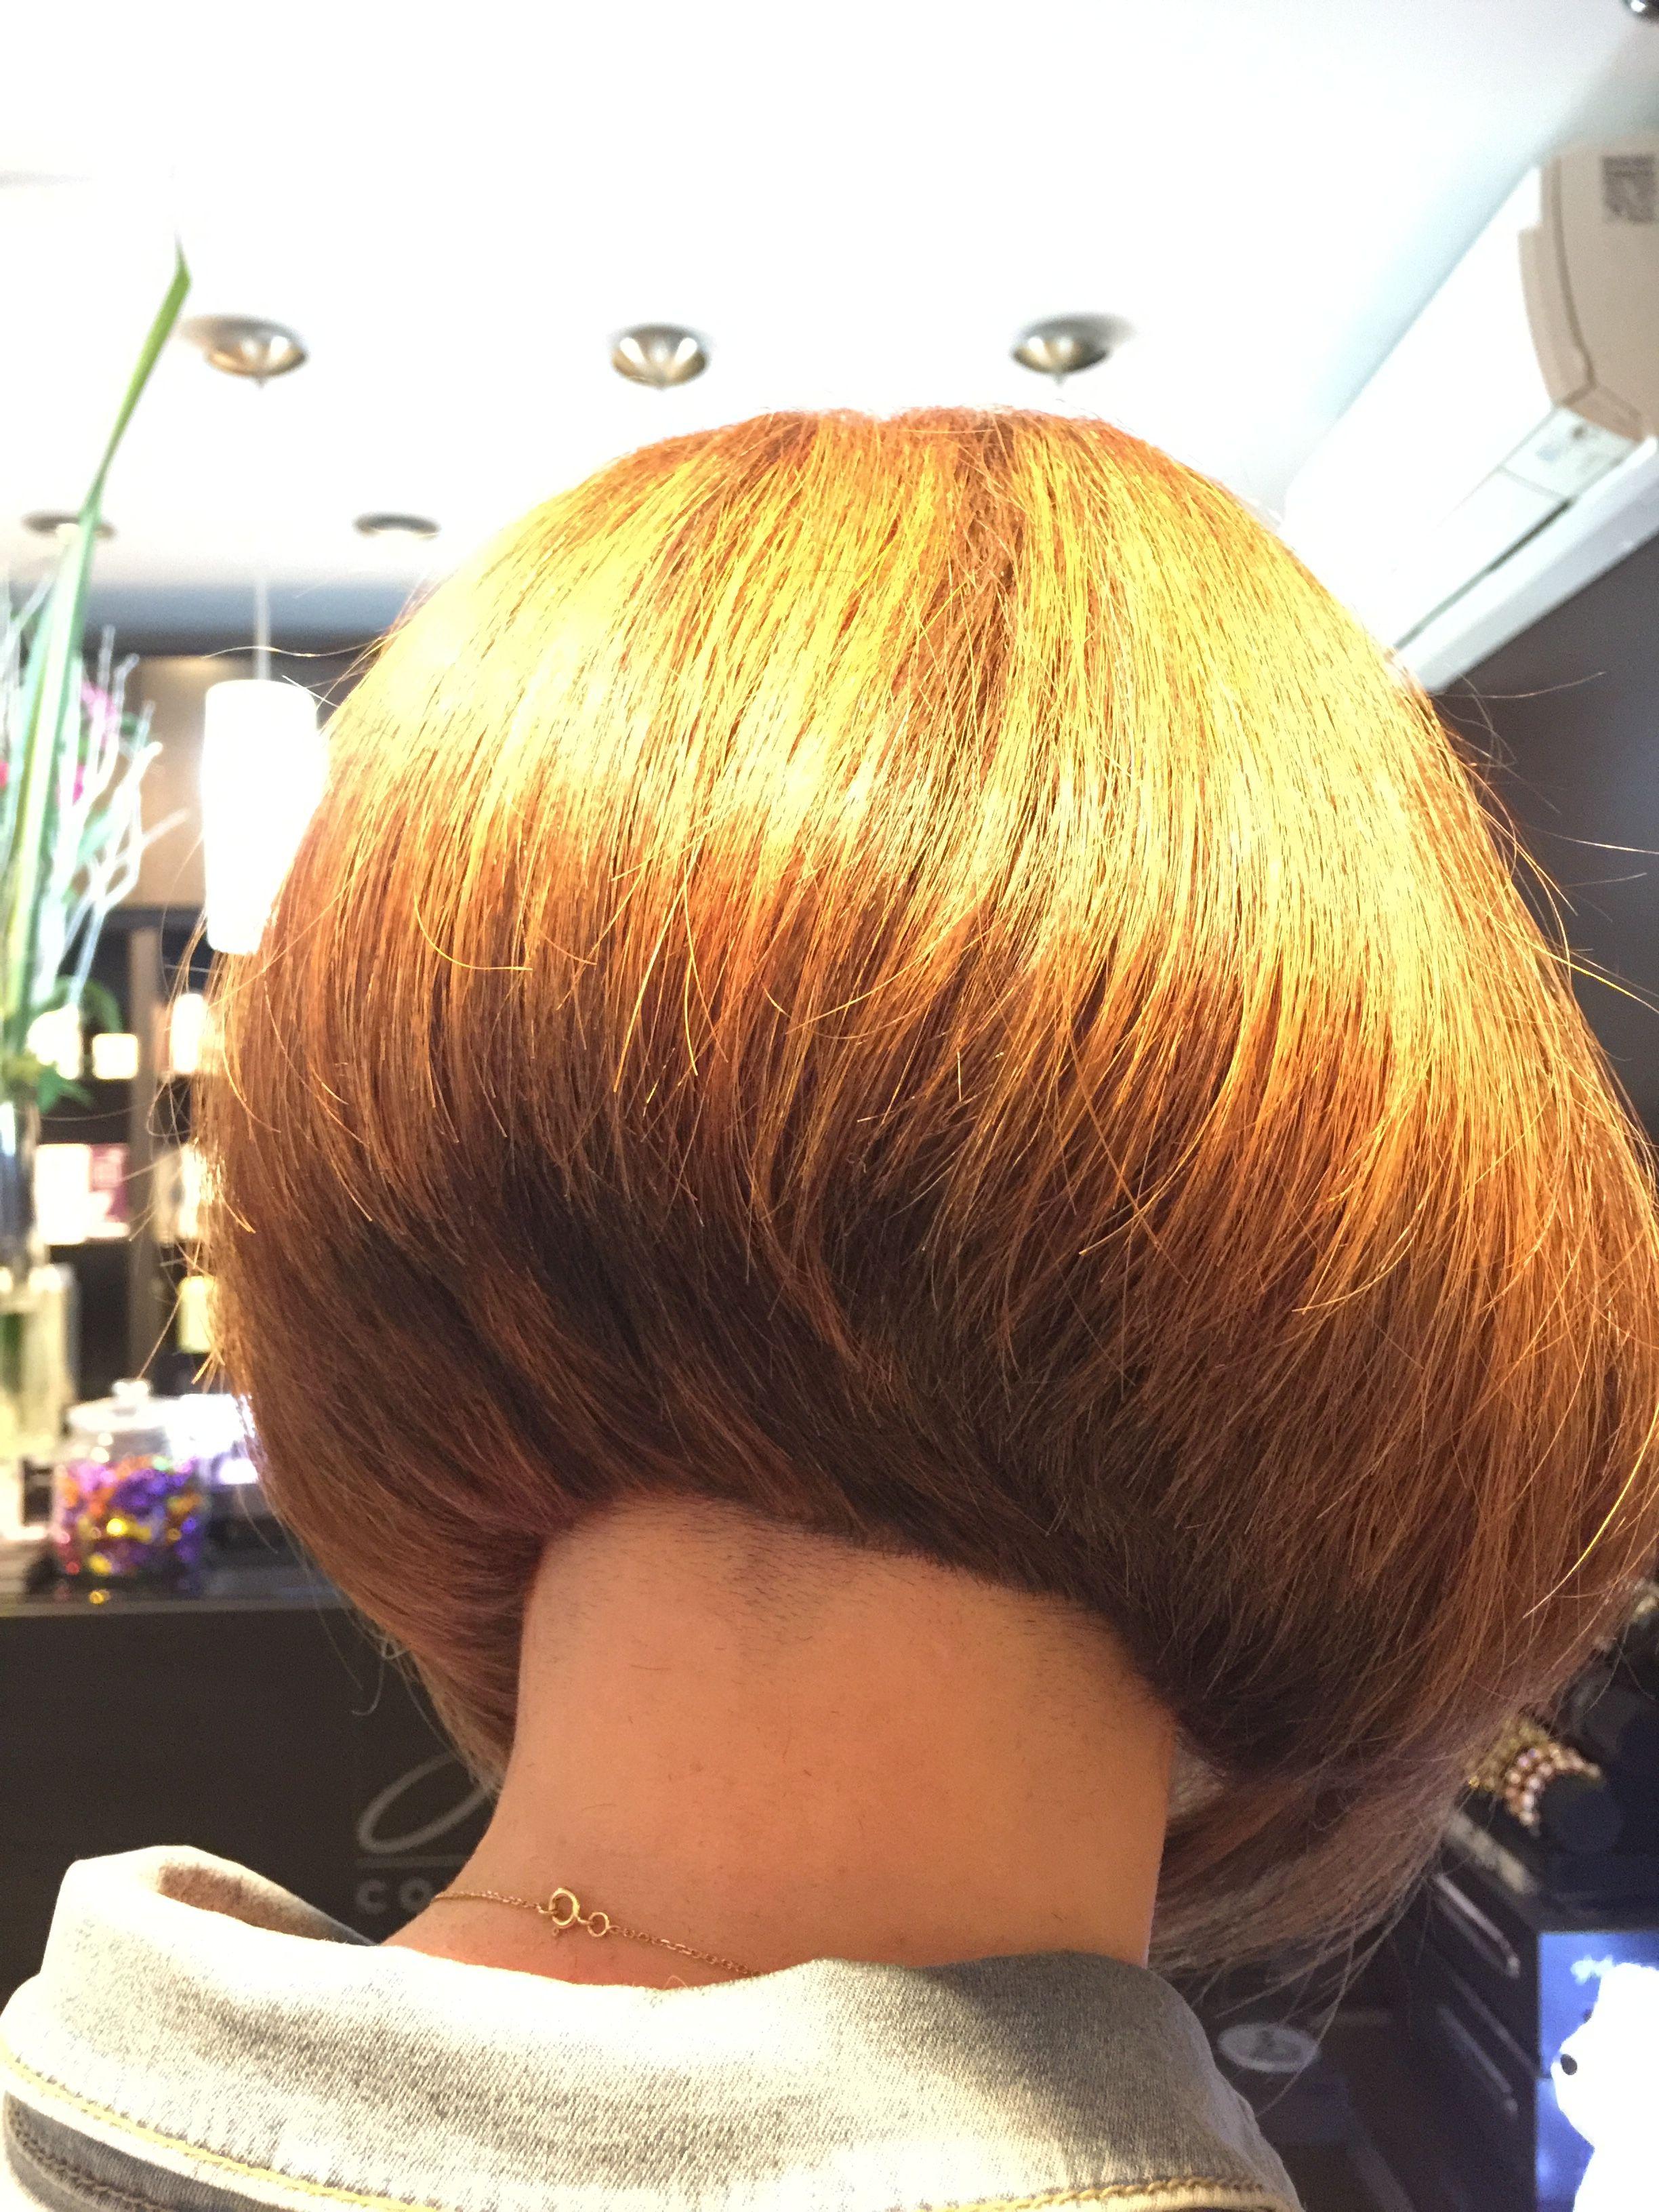 Pin by JohnpauL Coiffeurs Créateurs on Carré plongeant | Hair styles, Long hair styles, Beauty